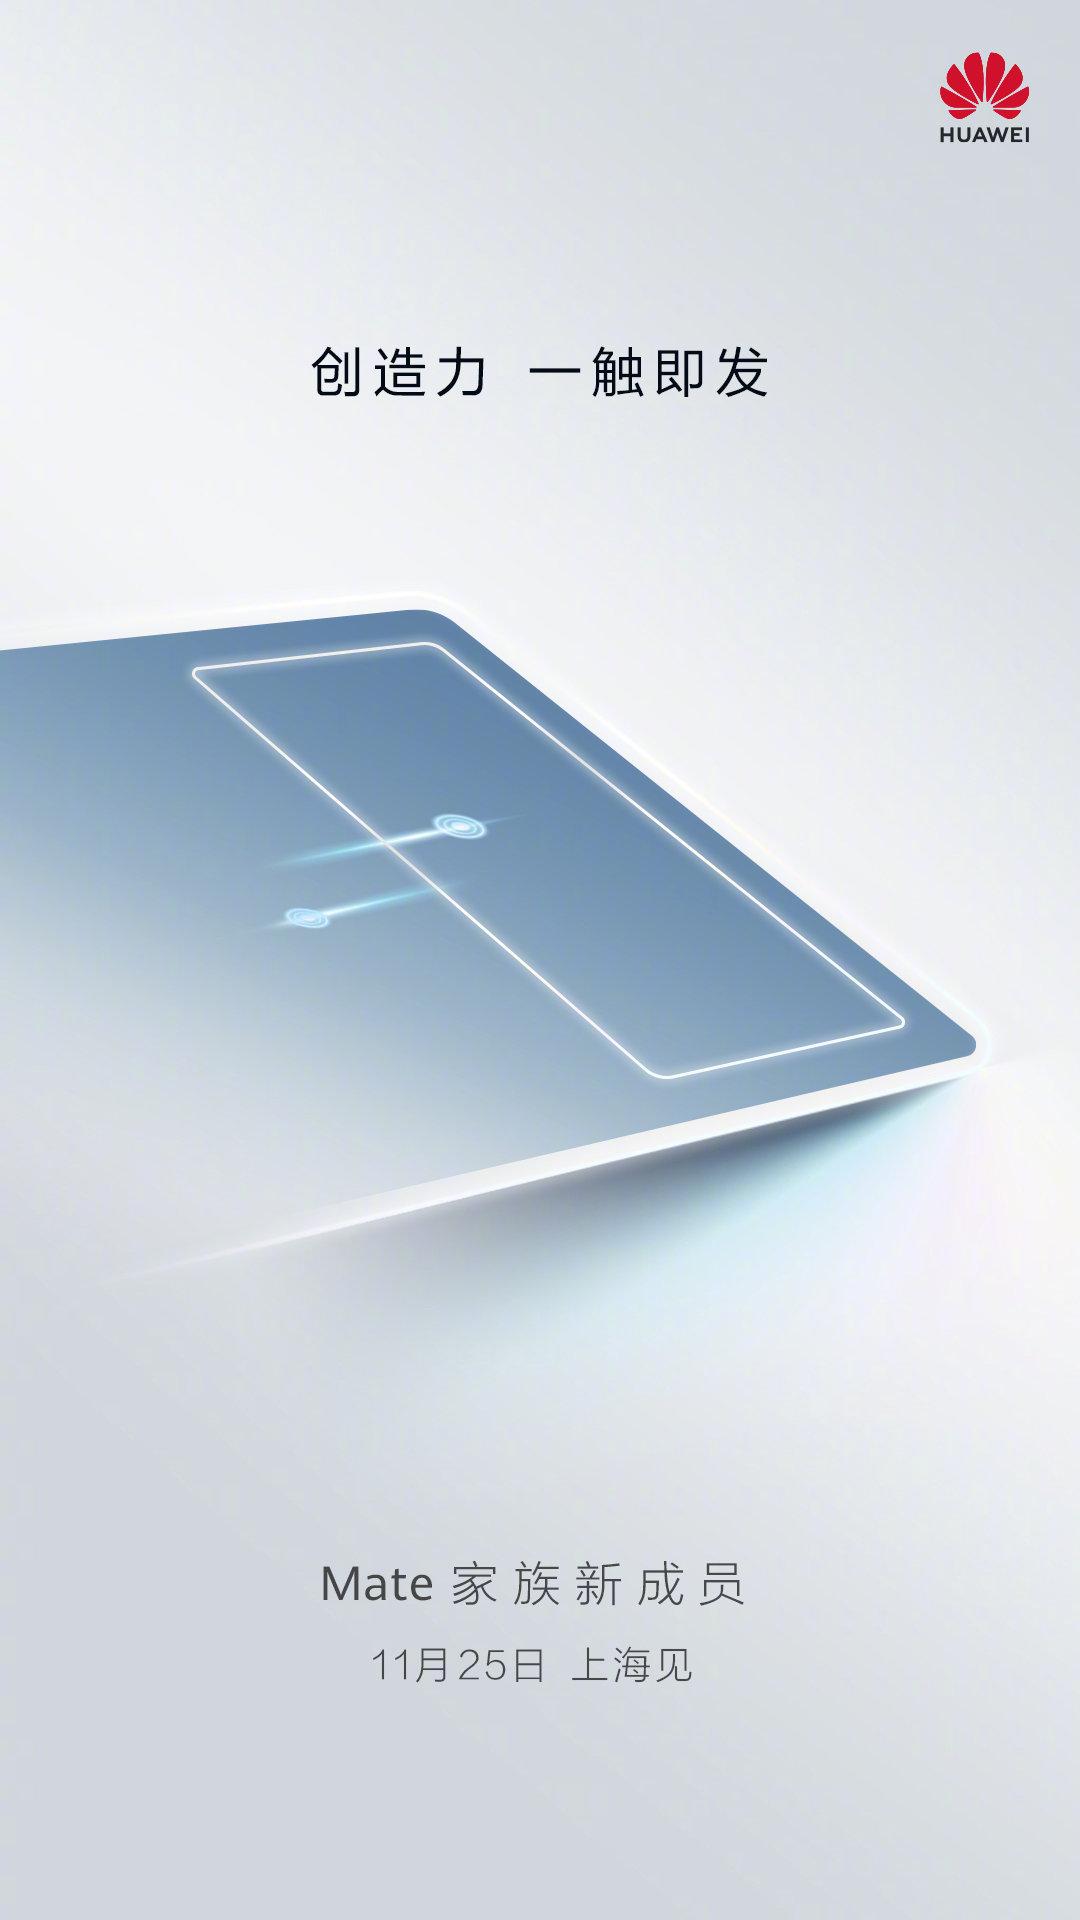 huawei matepad pro multi screen support